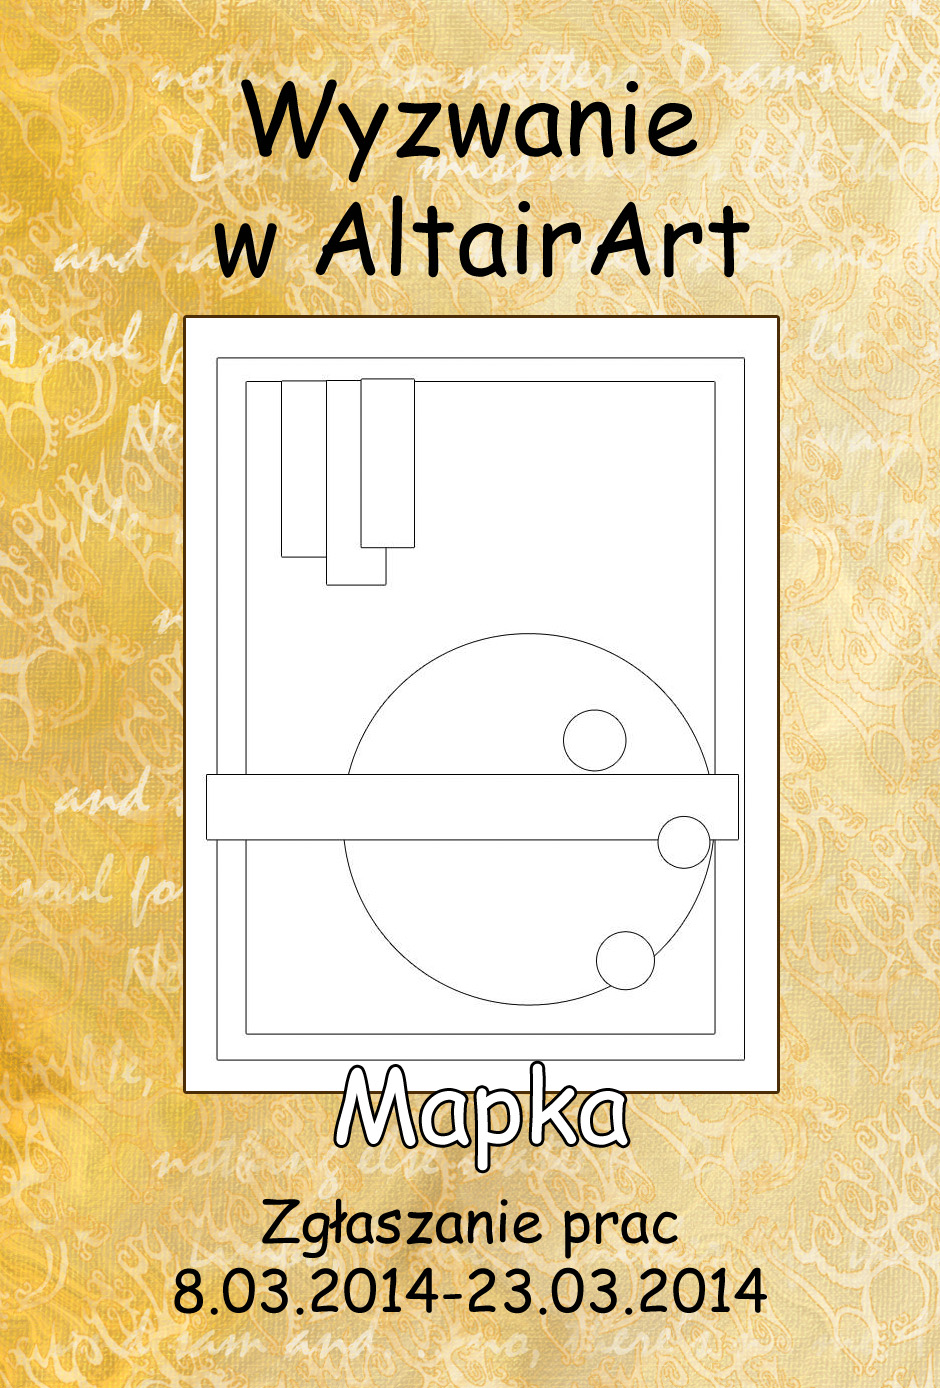 http://altair-art.blogspot.com/2014/03/wyzwanie-mapka.html